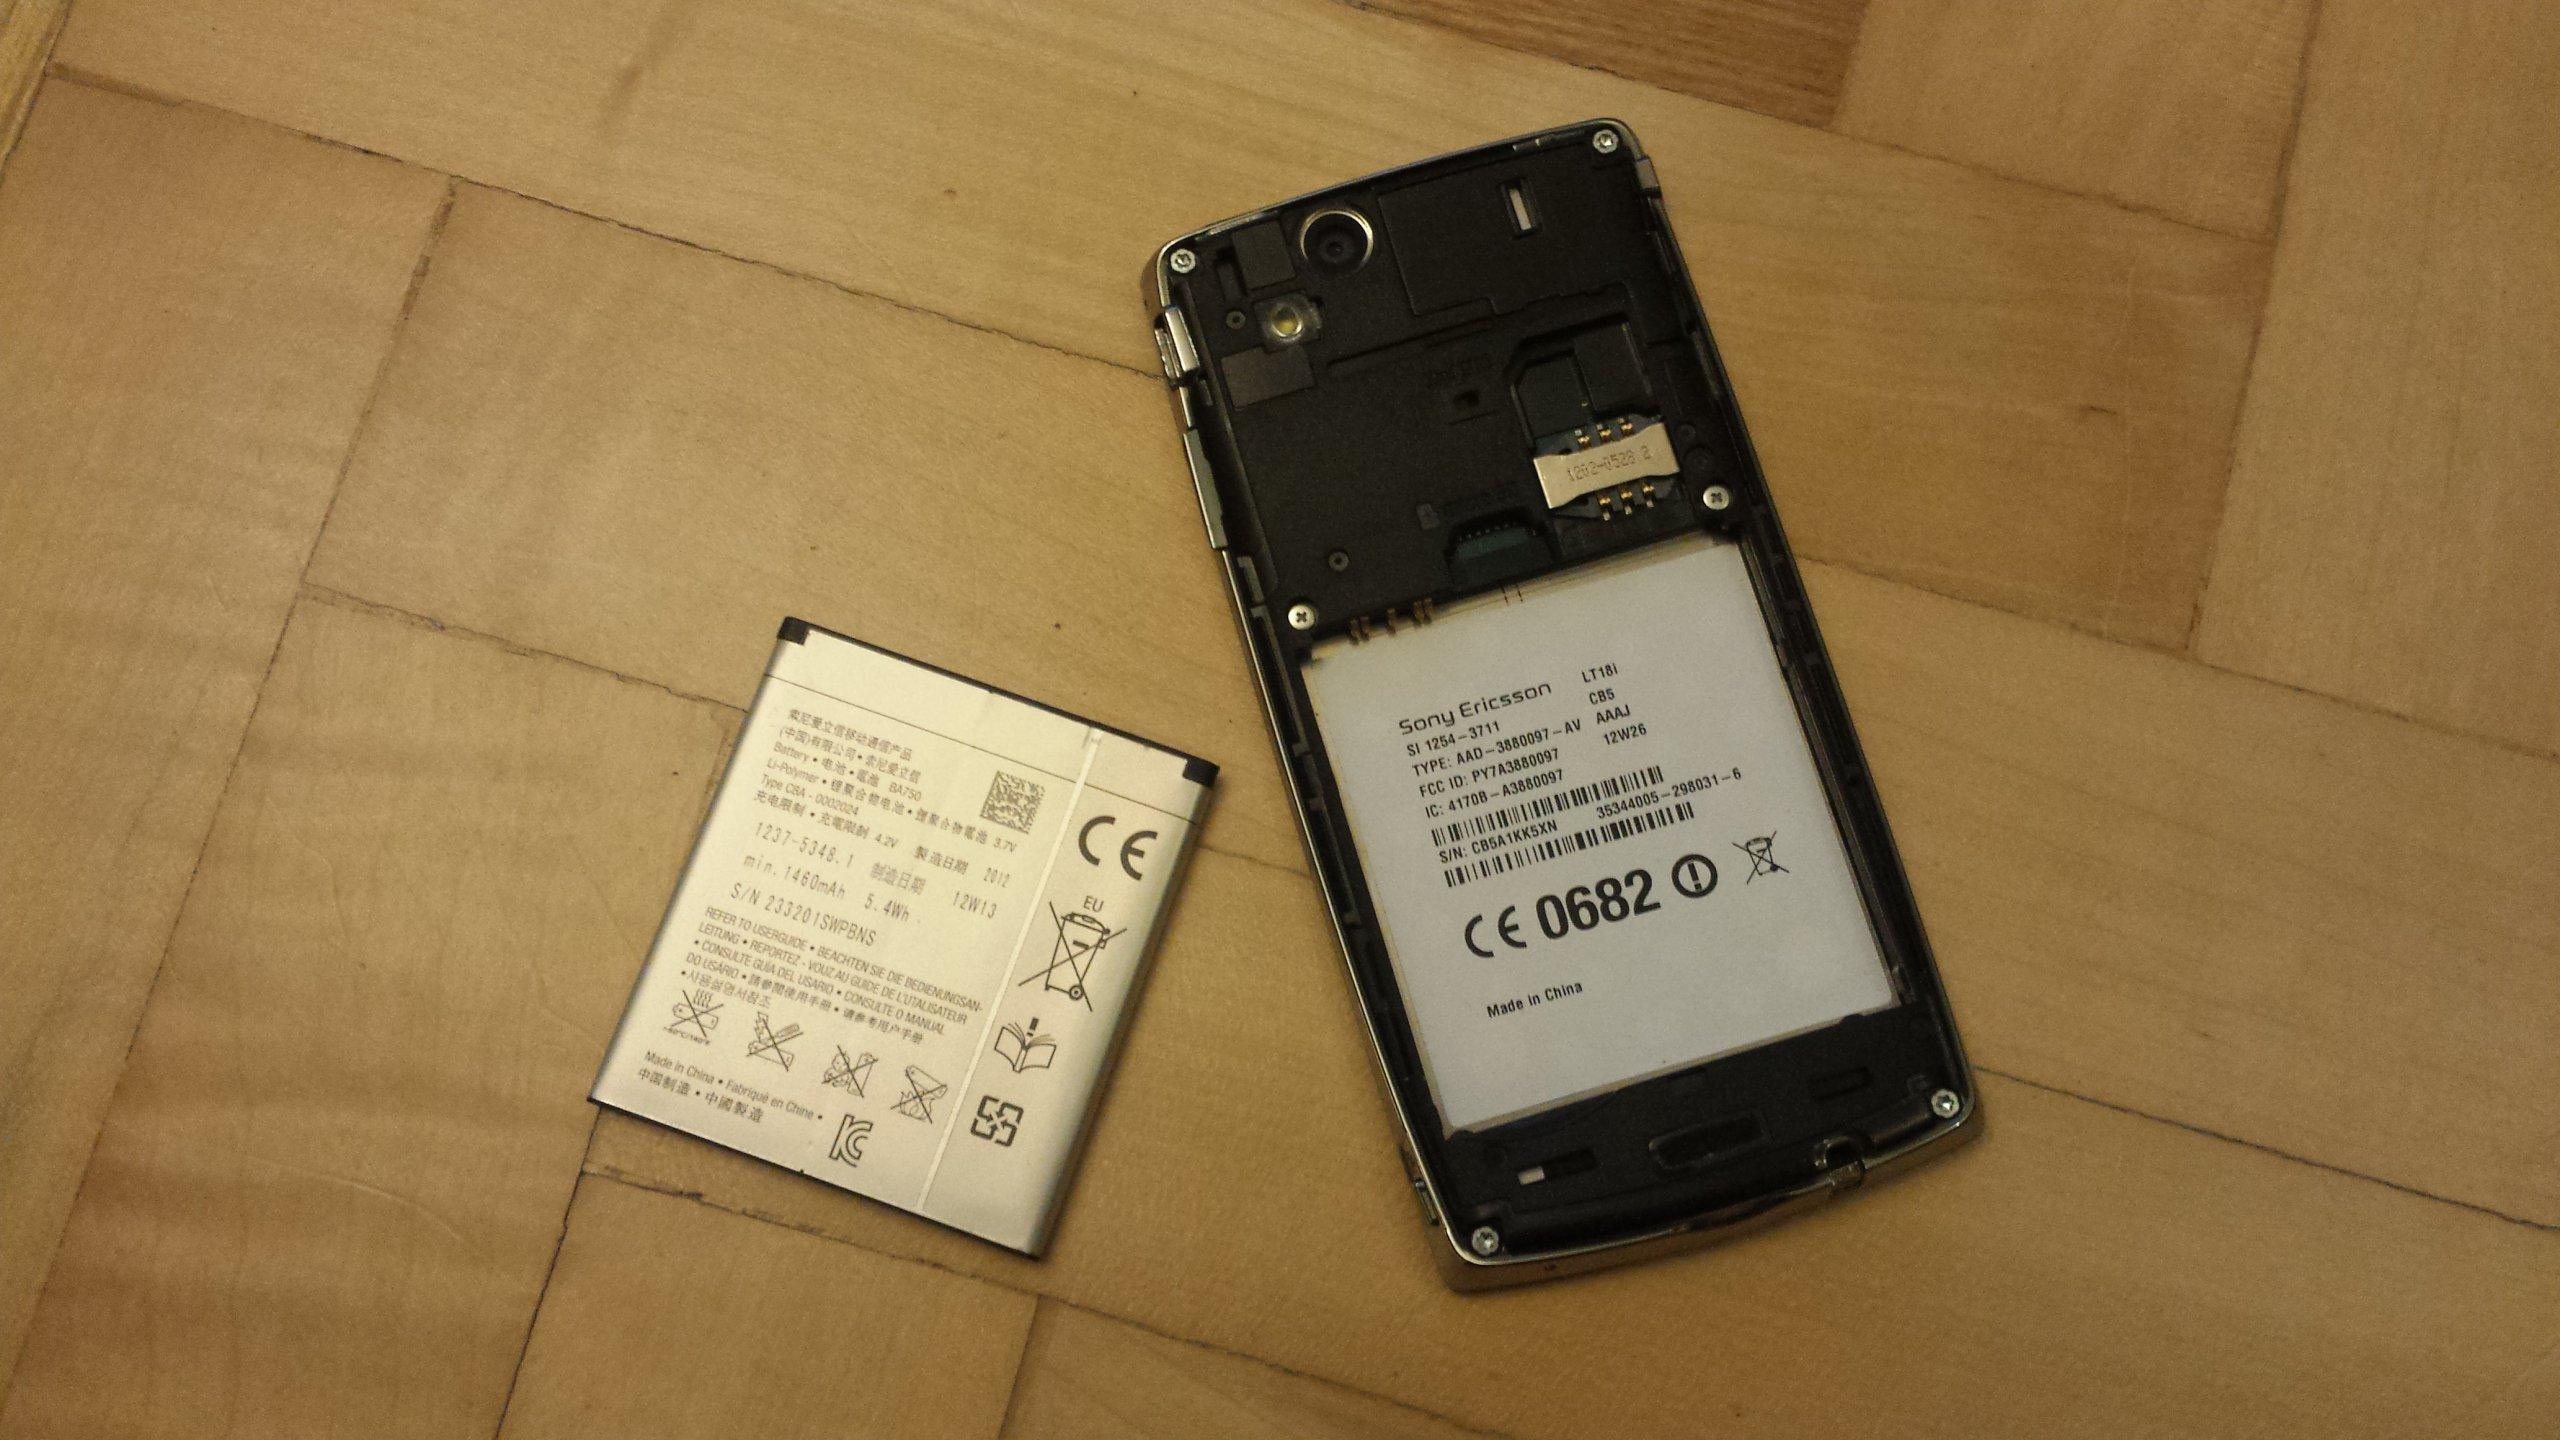 SONY Ericsson XPERIA ARC S LT18i (7124056056)